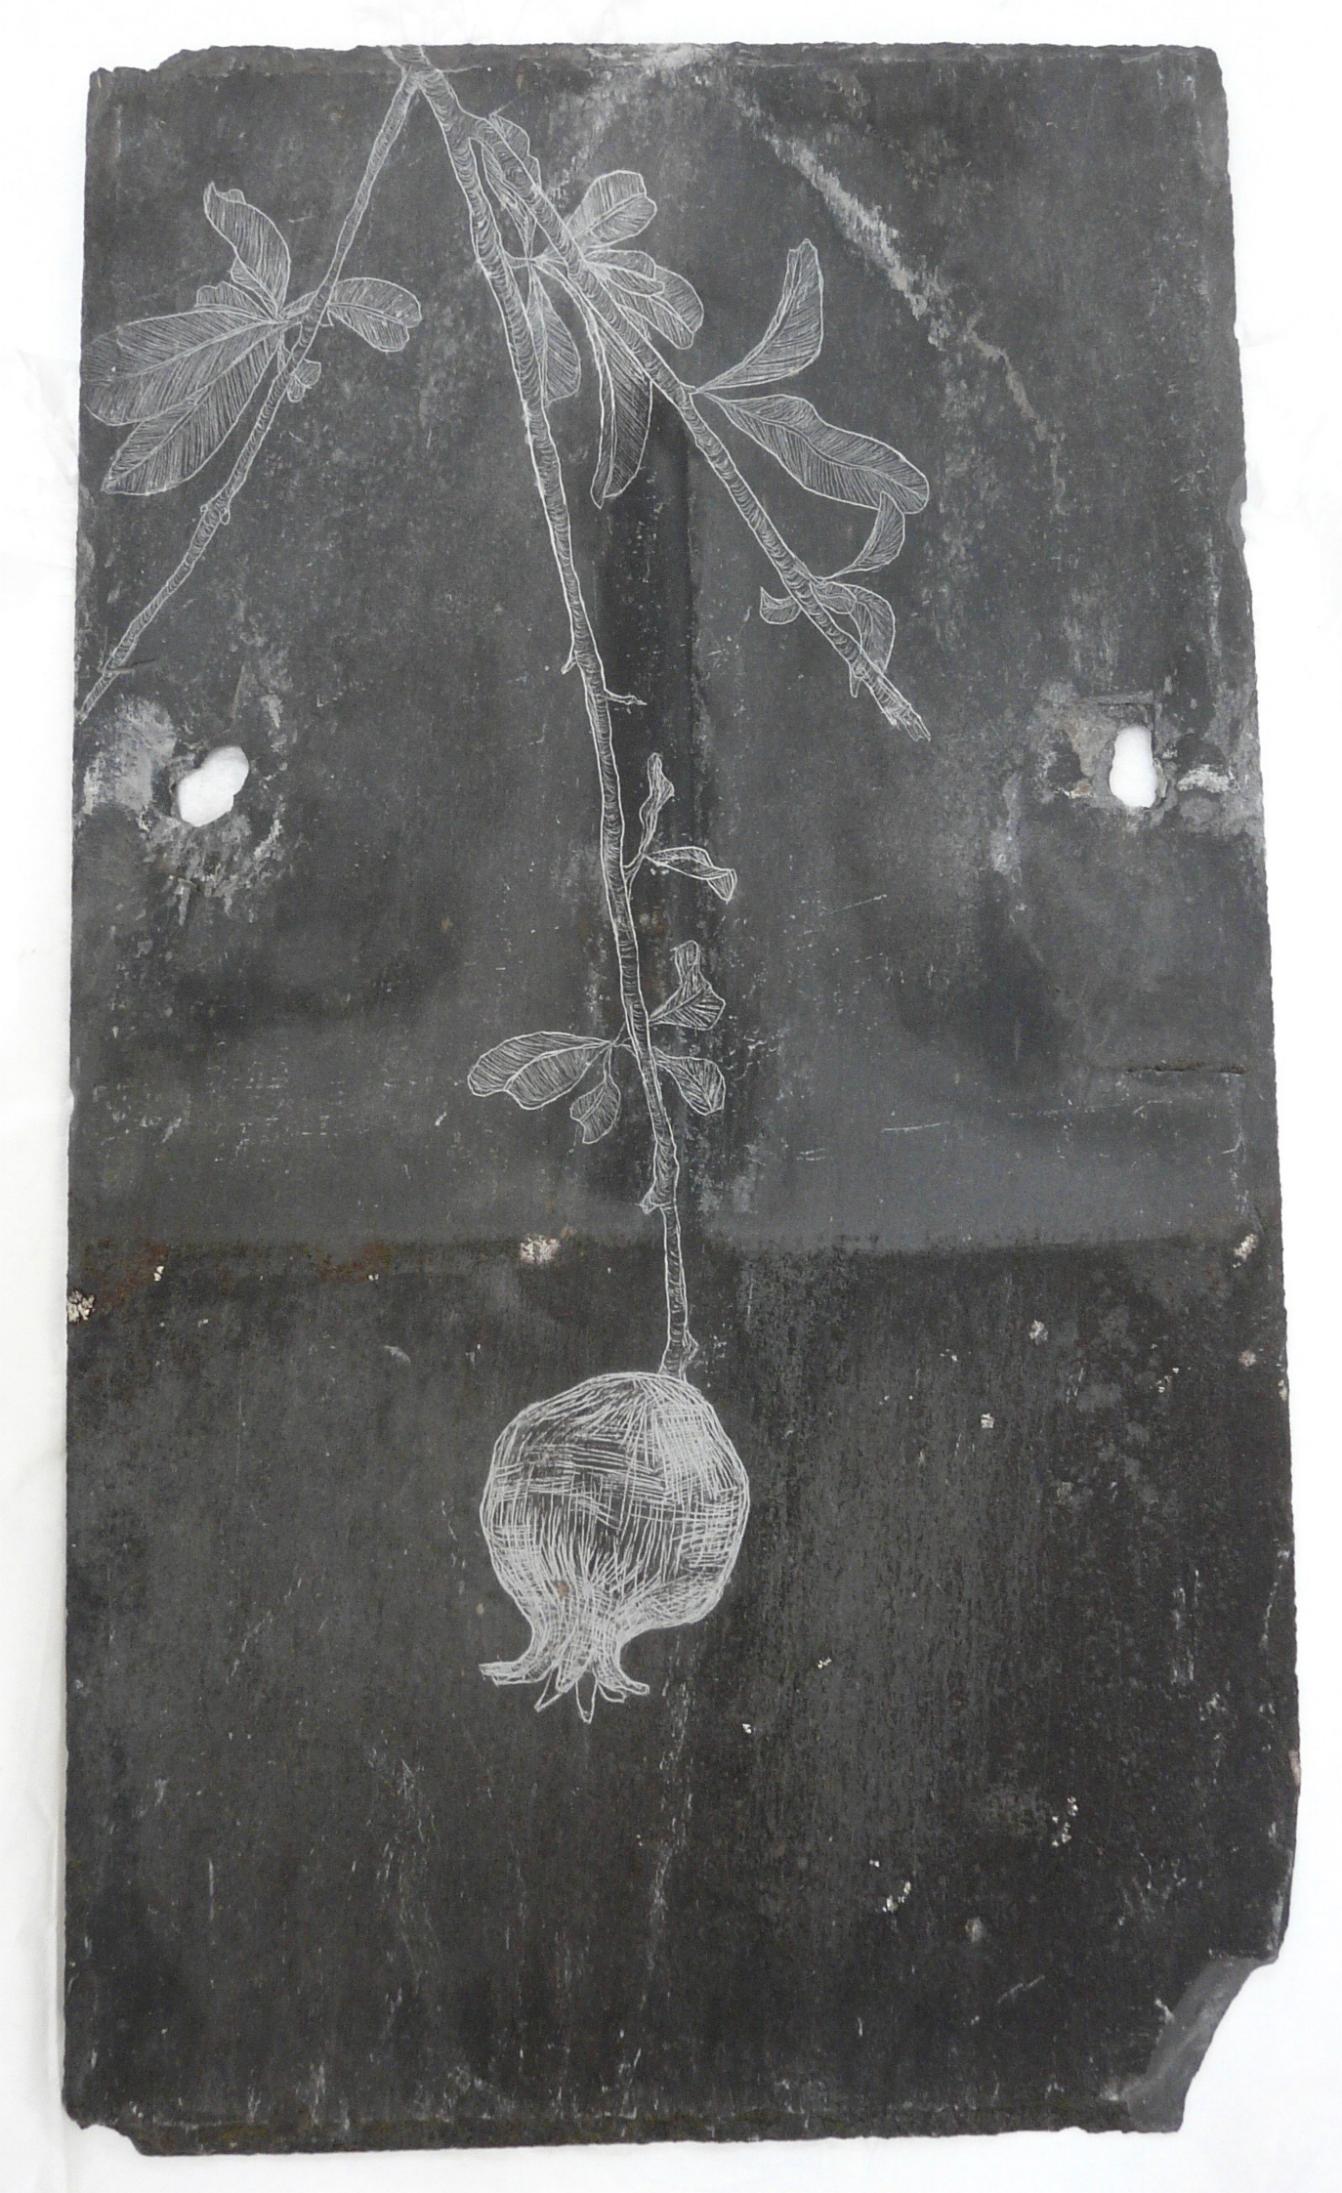 Pomegranate, Slate Engraving.